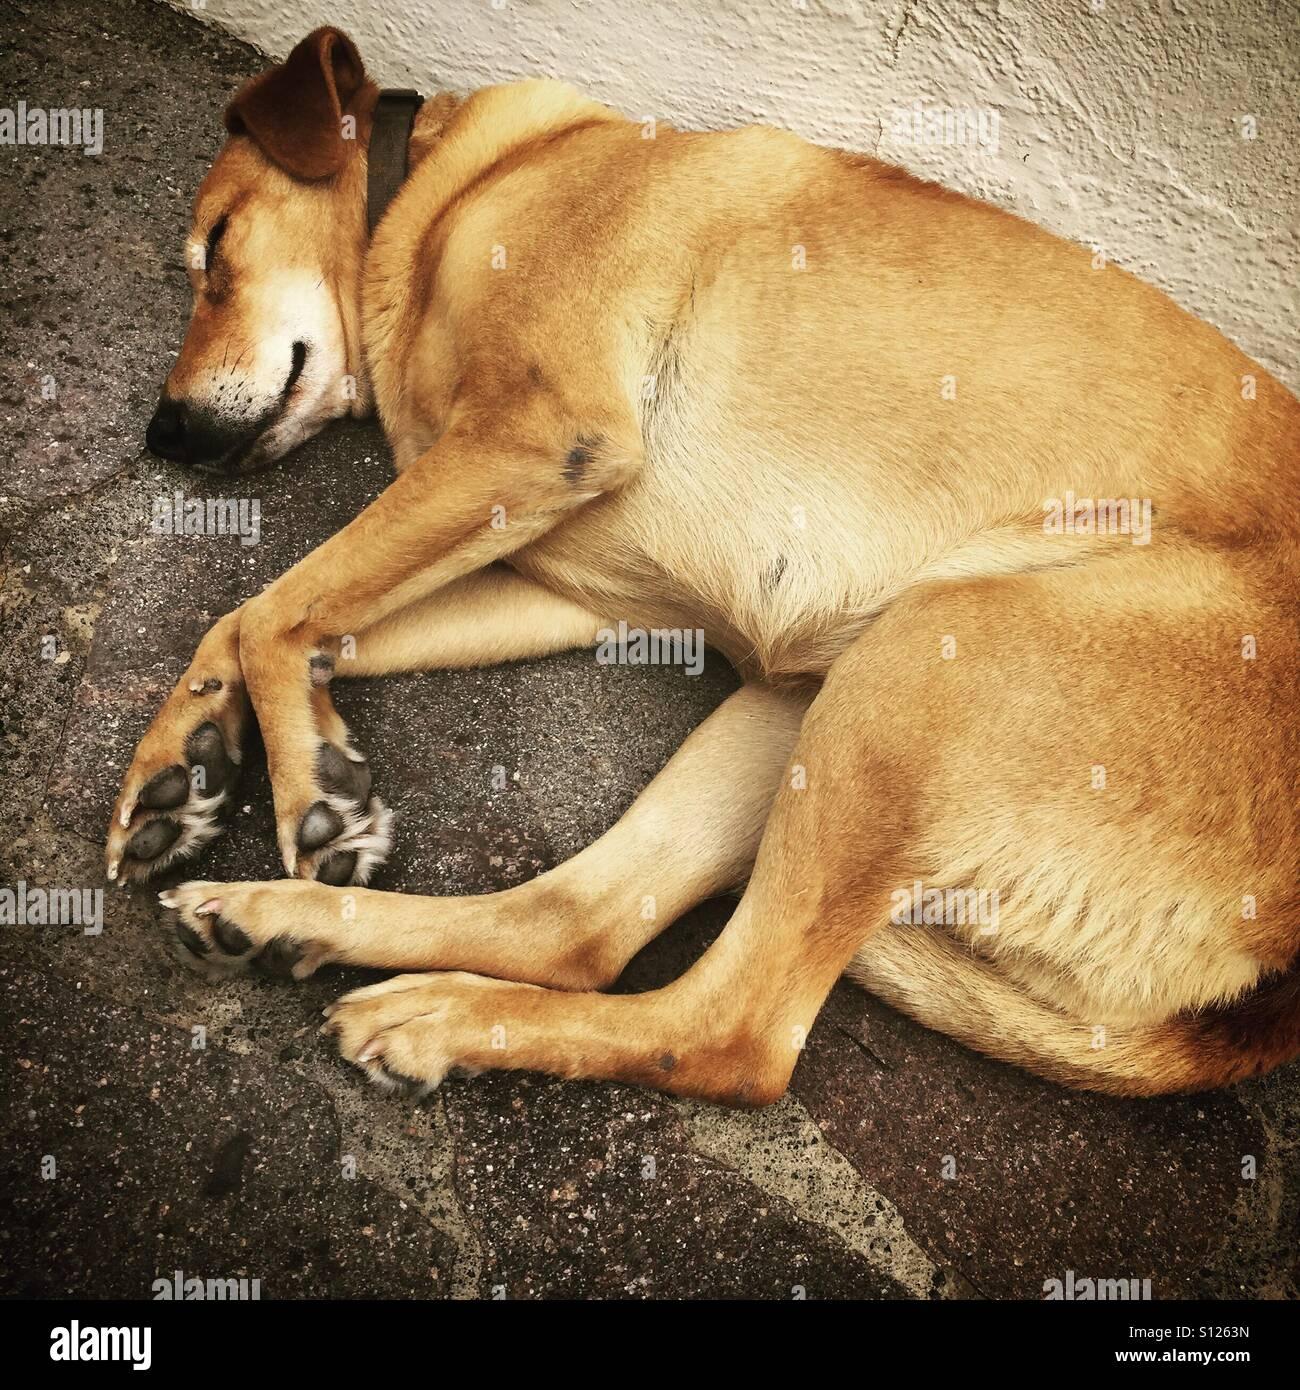 Sleepy old dog - Stock Image